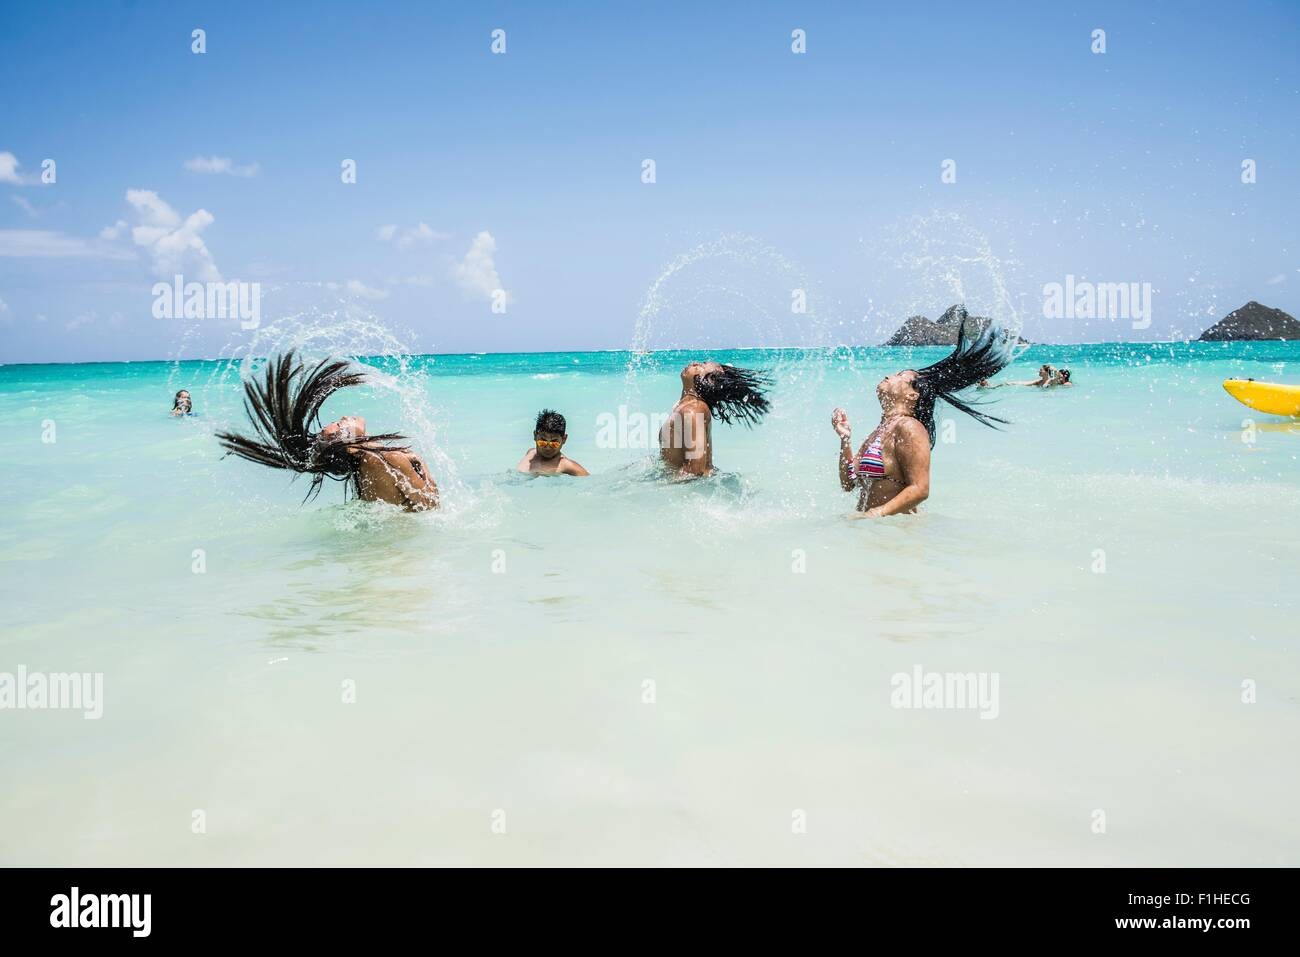 Side view of young women throwing long wet hair back in sea at Lanikai Beach, Oahu, Hawaii, USA - Stock Image